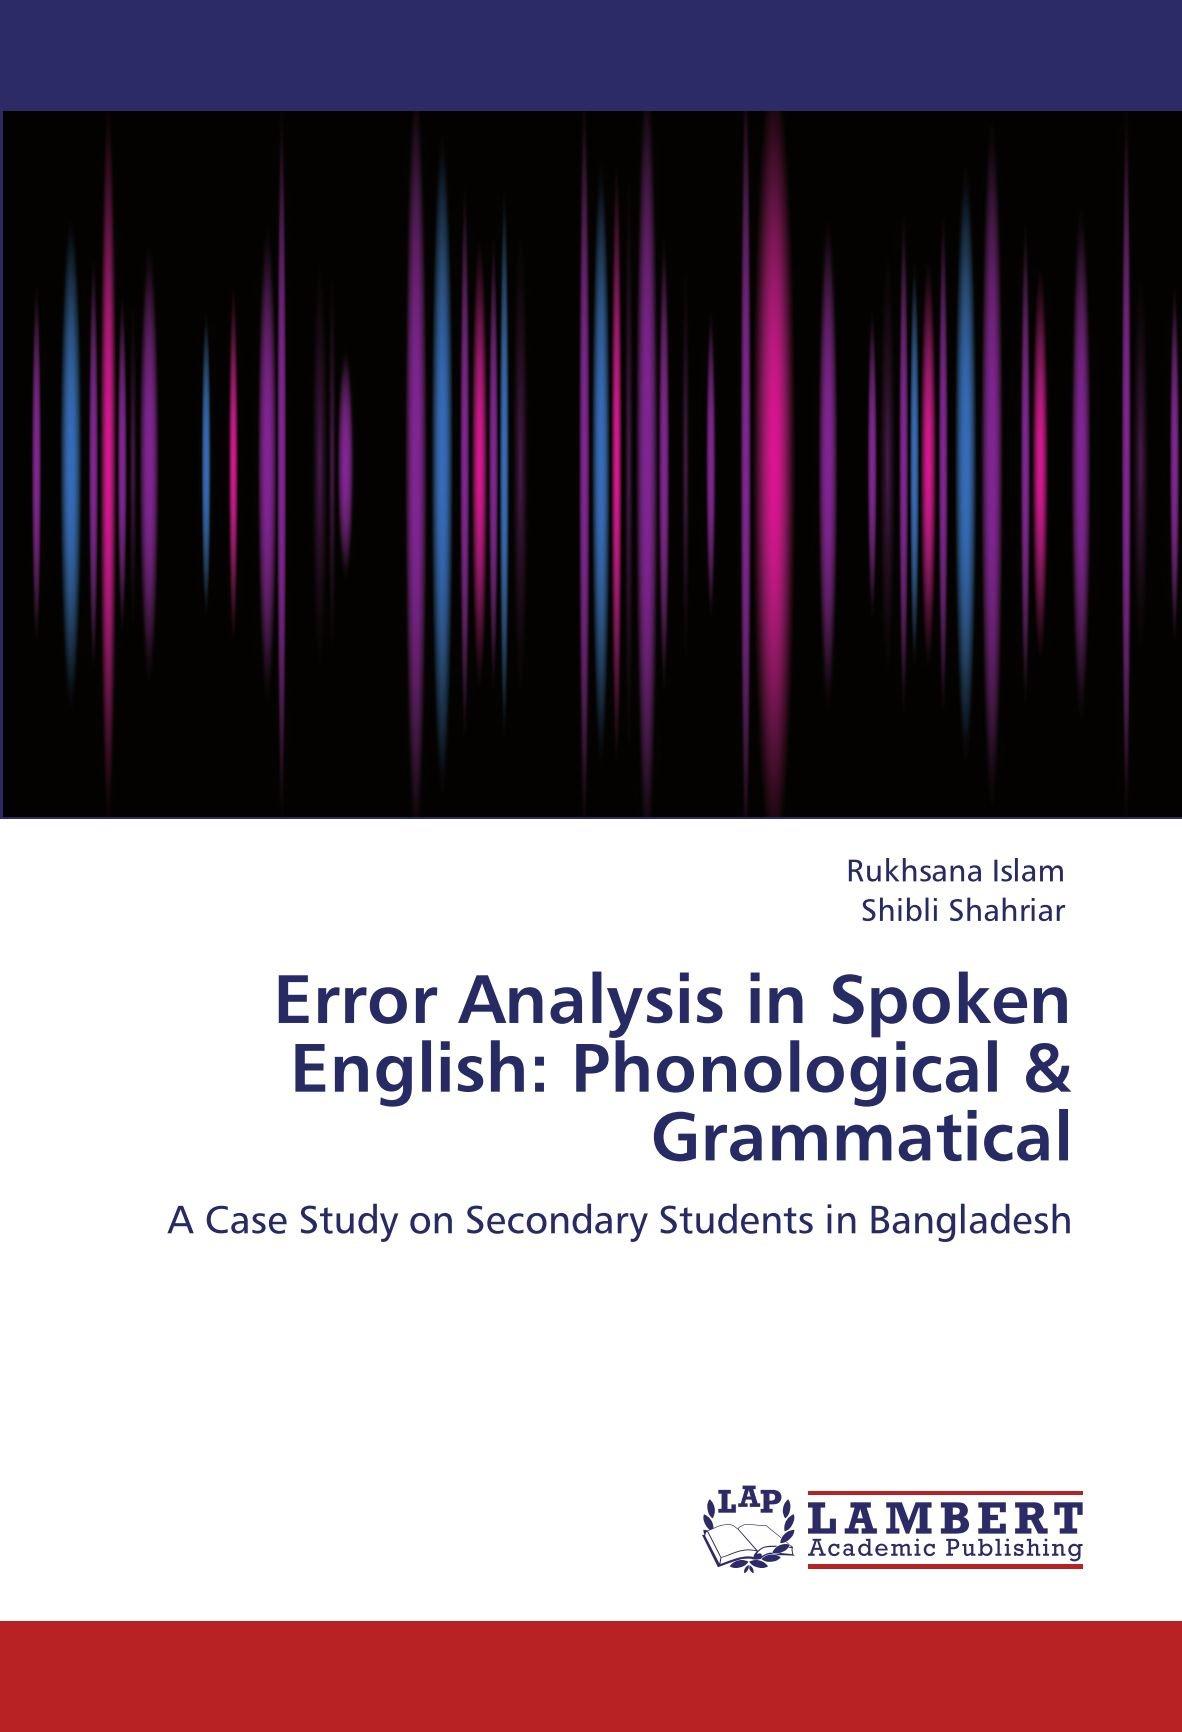 Error Analysis in Spoken English